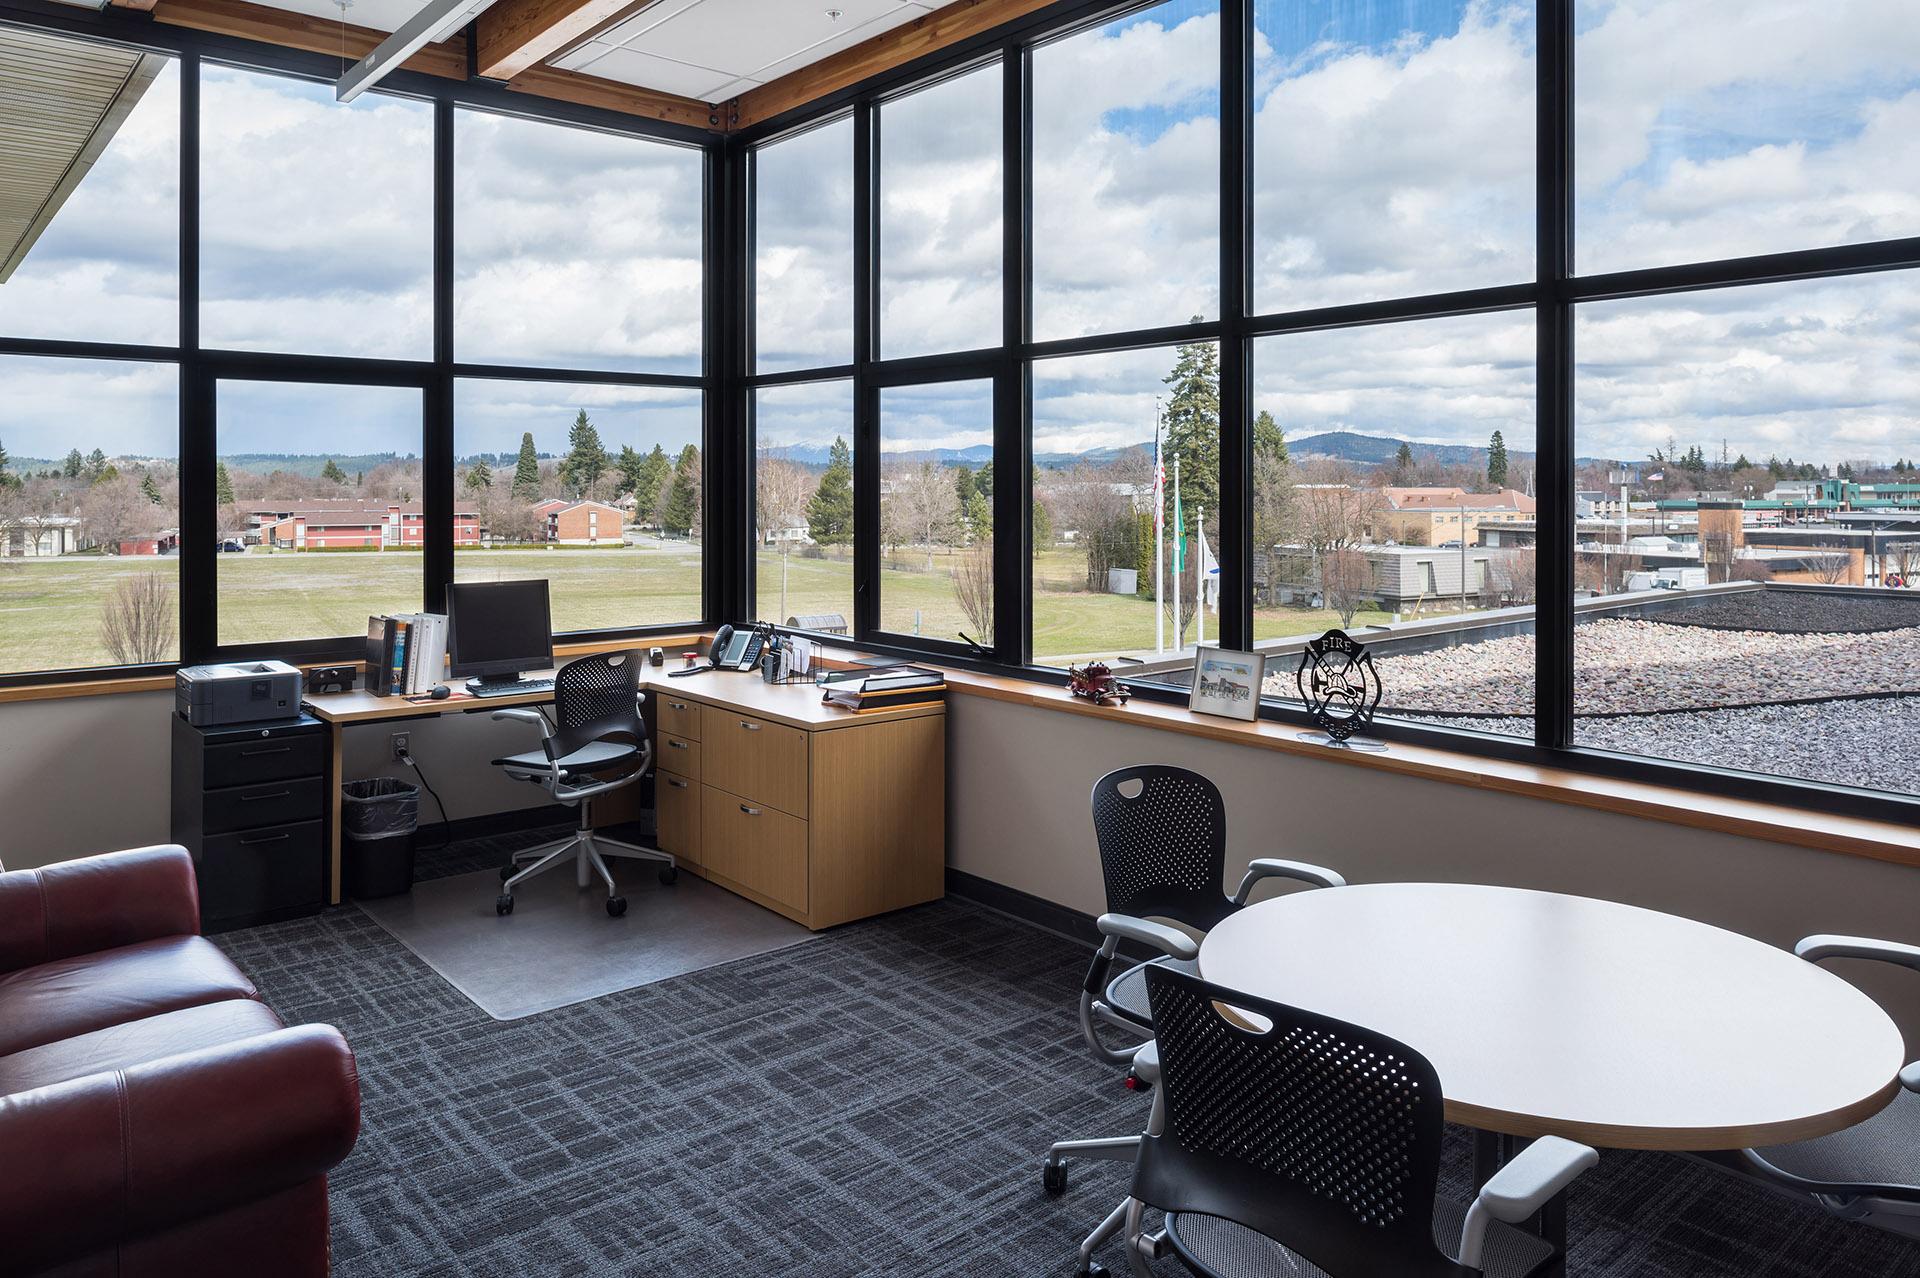 Spokane Valley City Hall Office